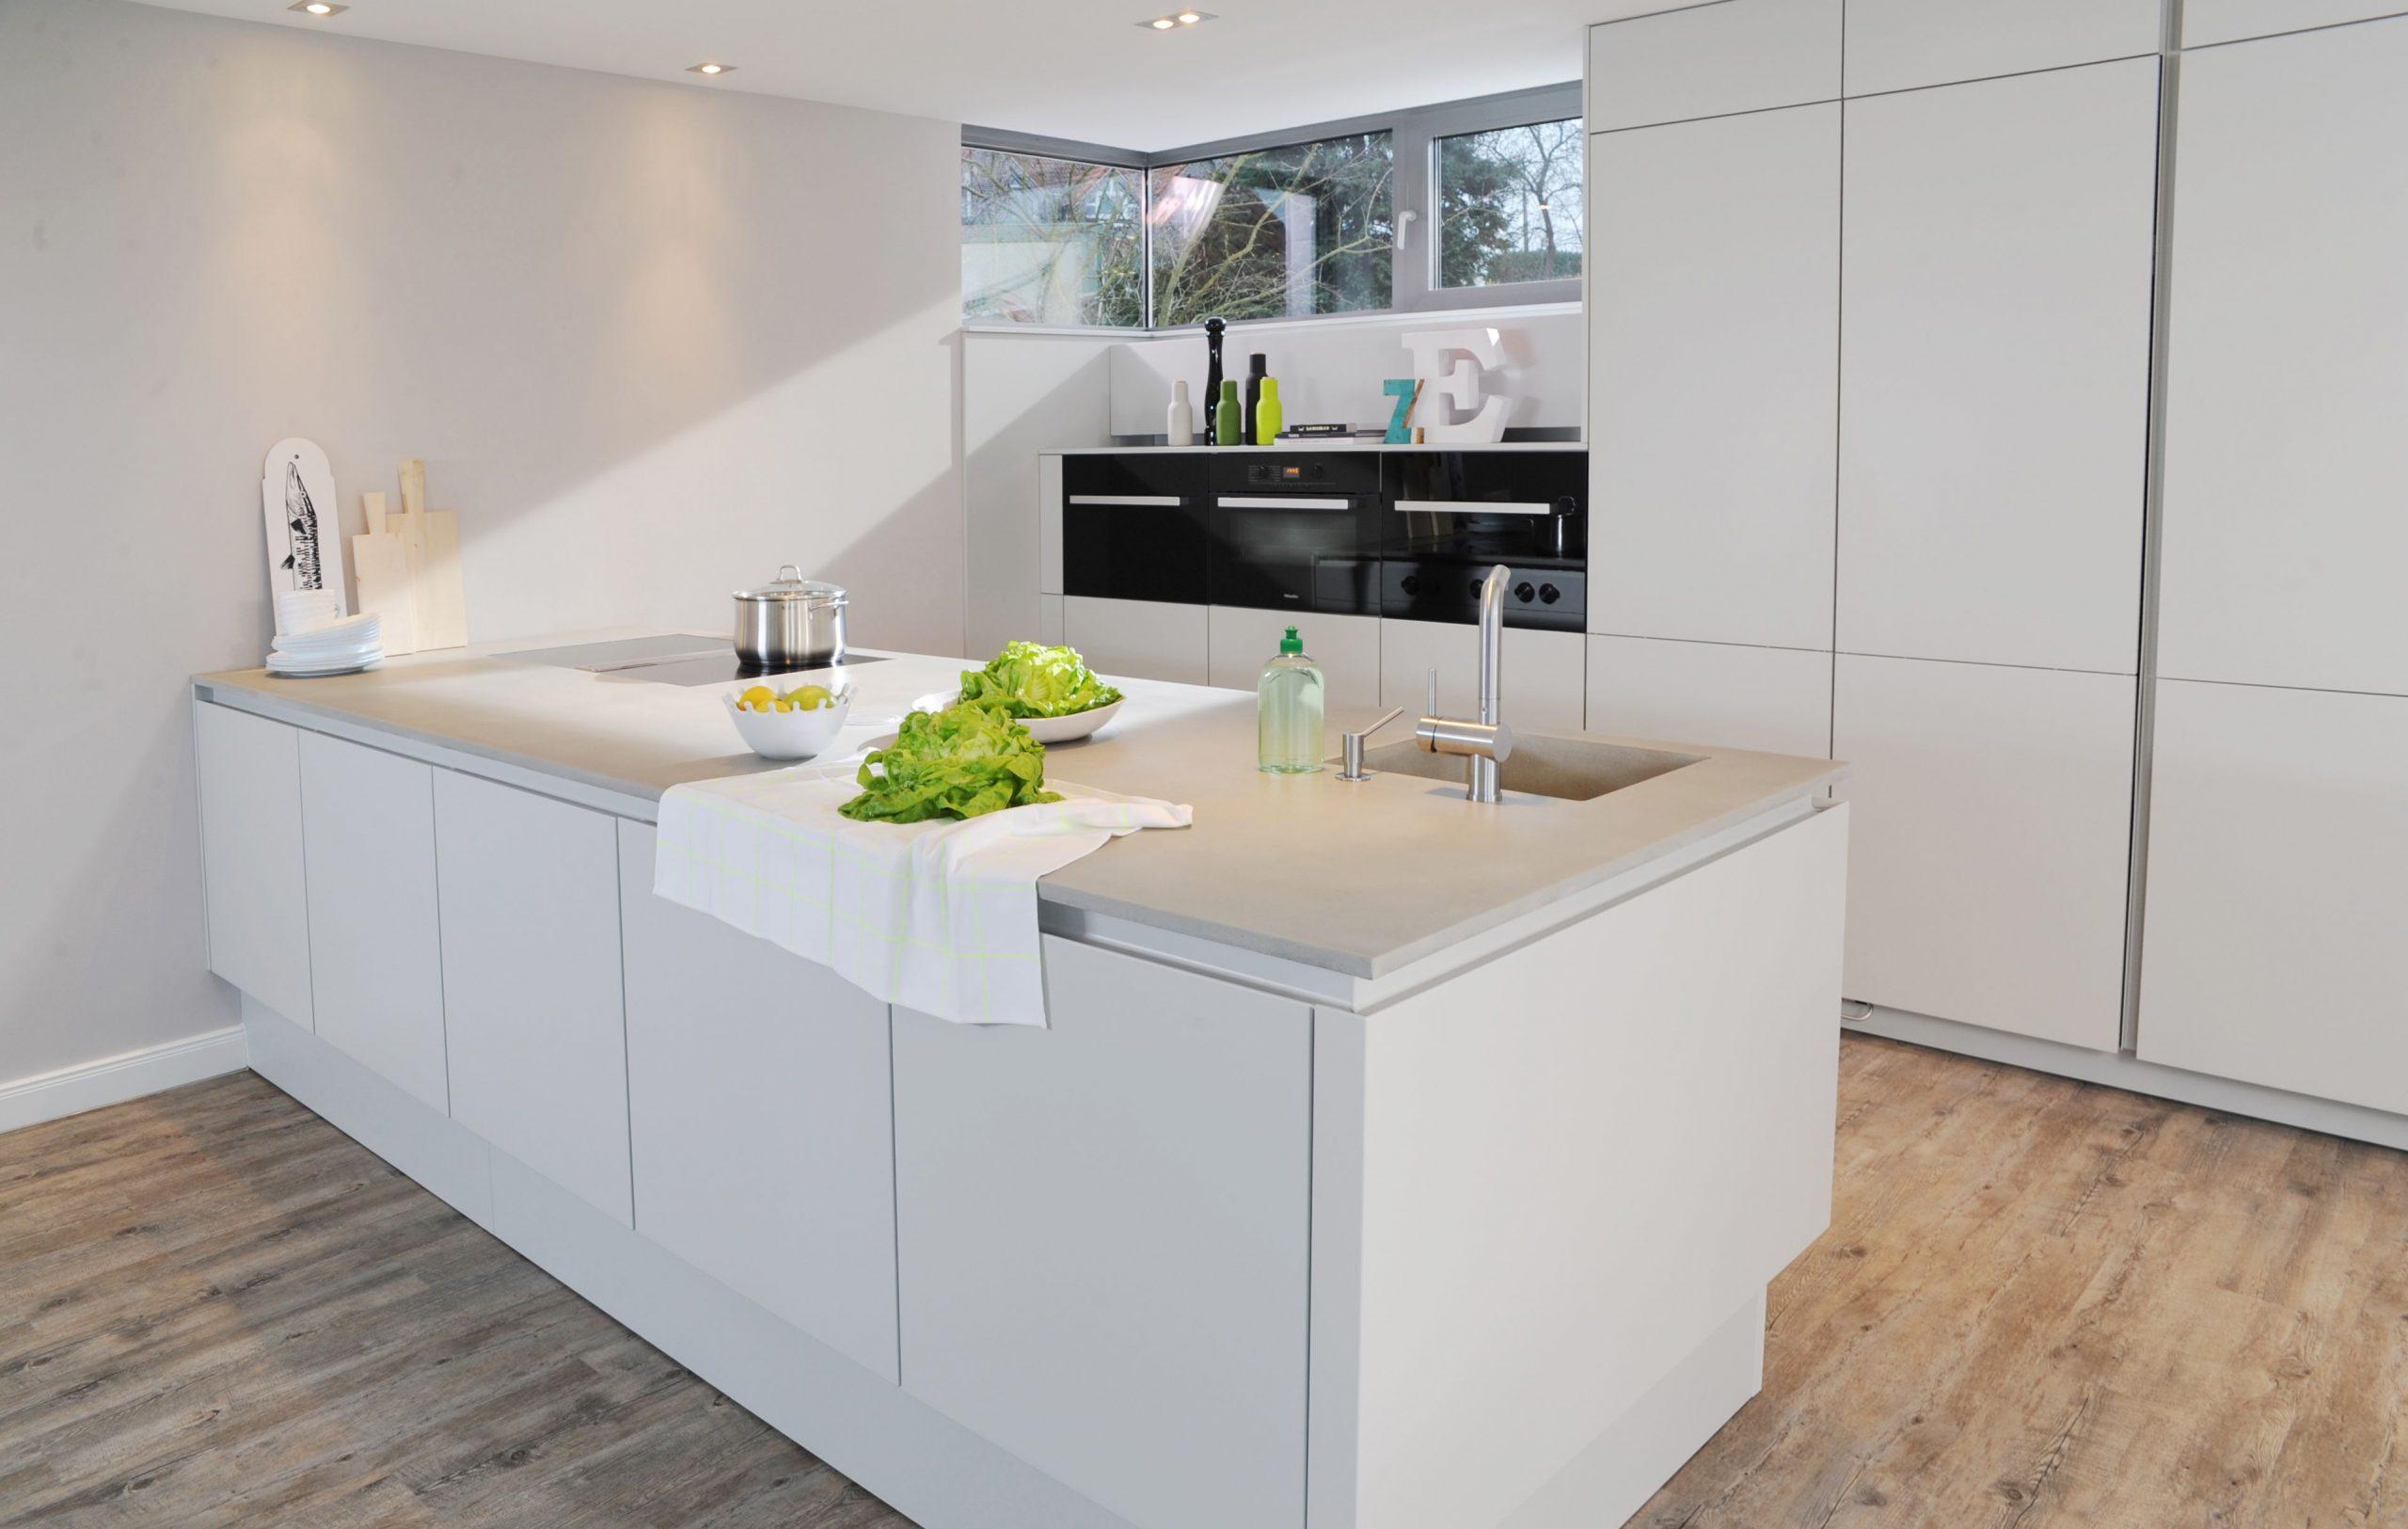 Full Size of Küche Ohne Geräte Möbel Boss Günstige Küche Ohne Geräte Komplette Küche Ohne Geräte Küche Ohne Geräte Günstig Kaufen Küche Küche Ohne Geräte